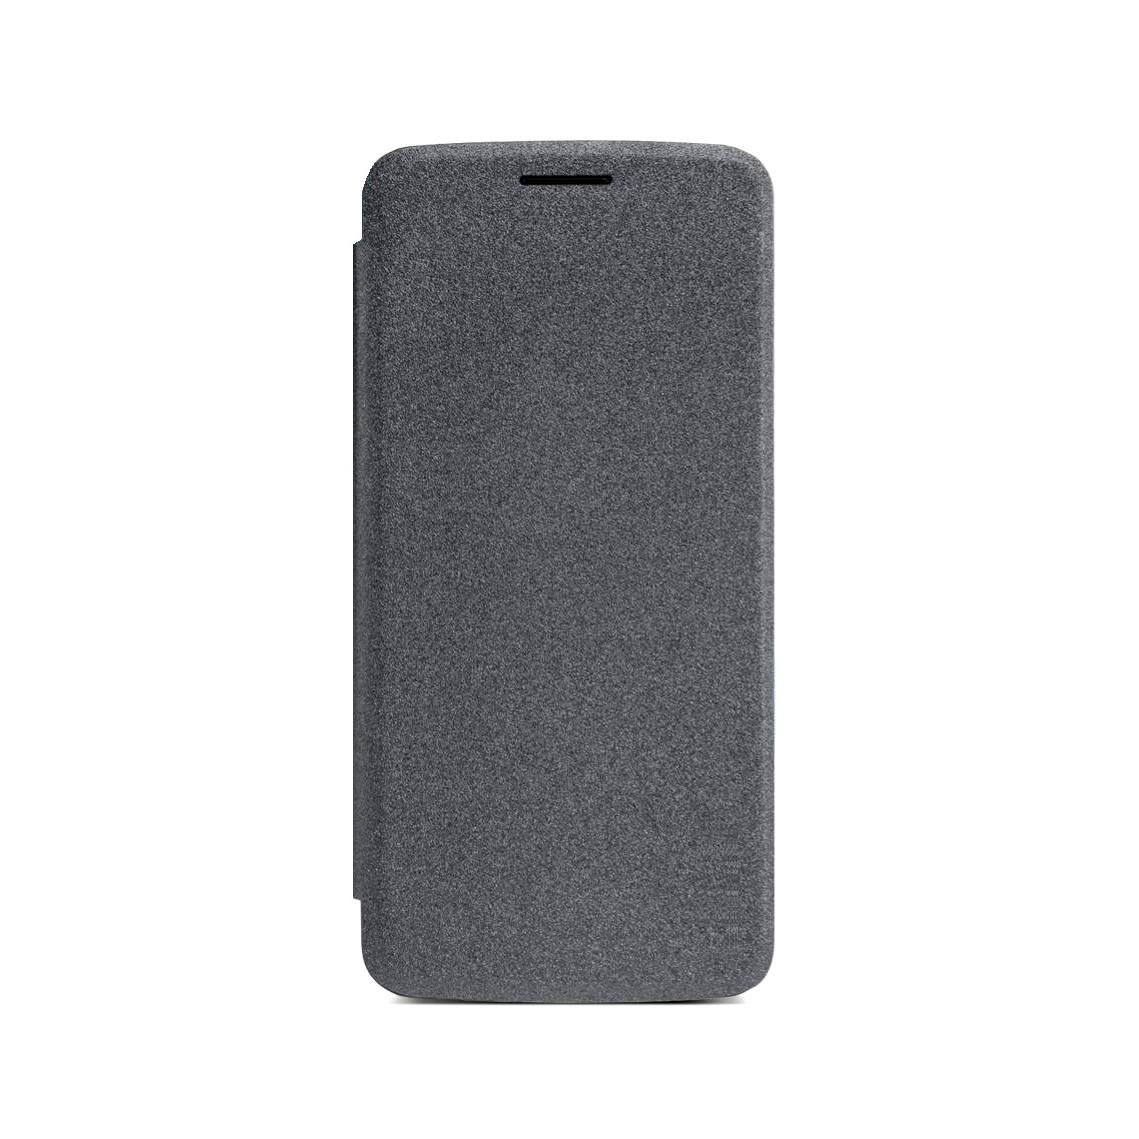 promo code bc0da 1312e Flip Cover for Motorola Moto G6 - Black